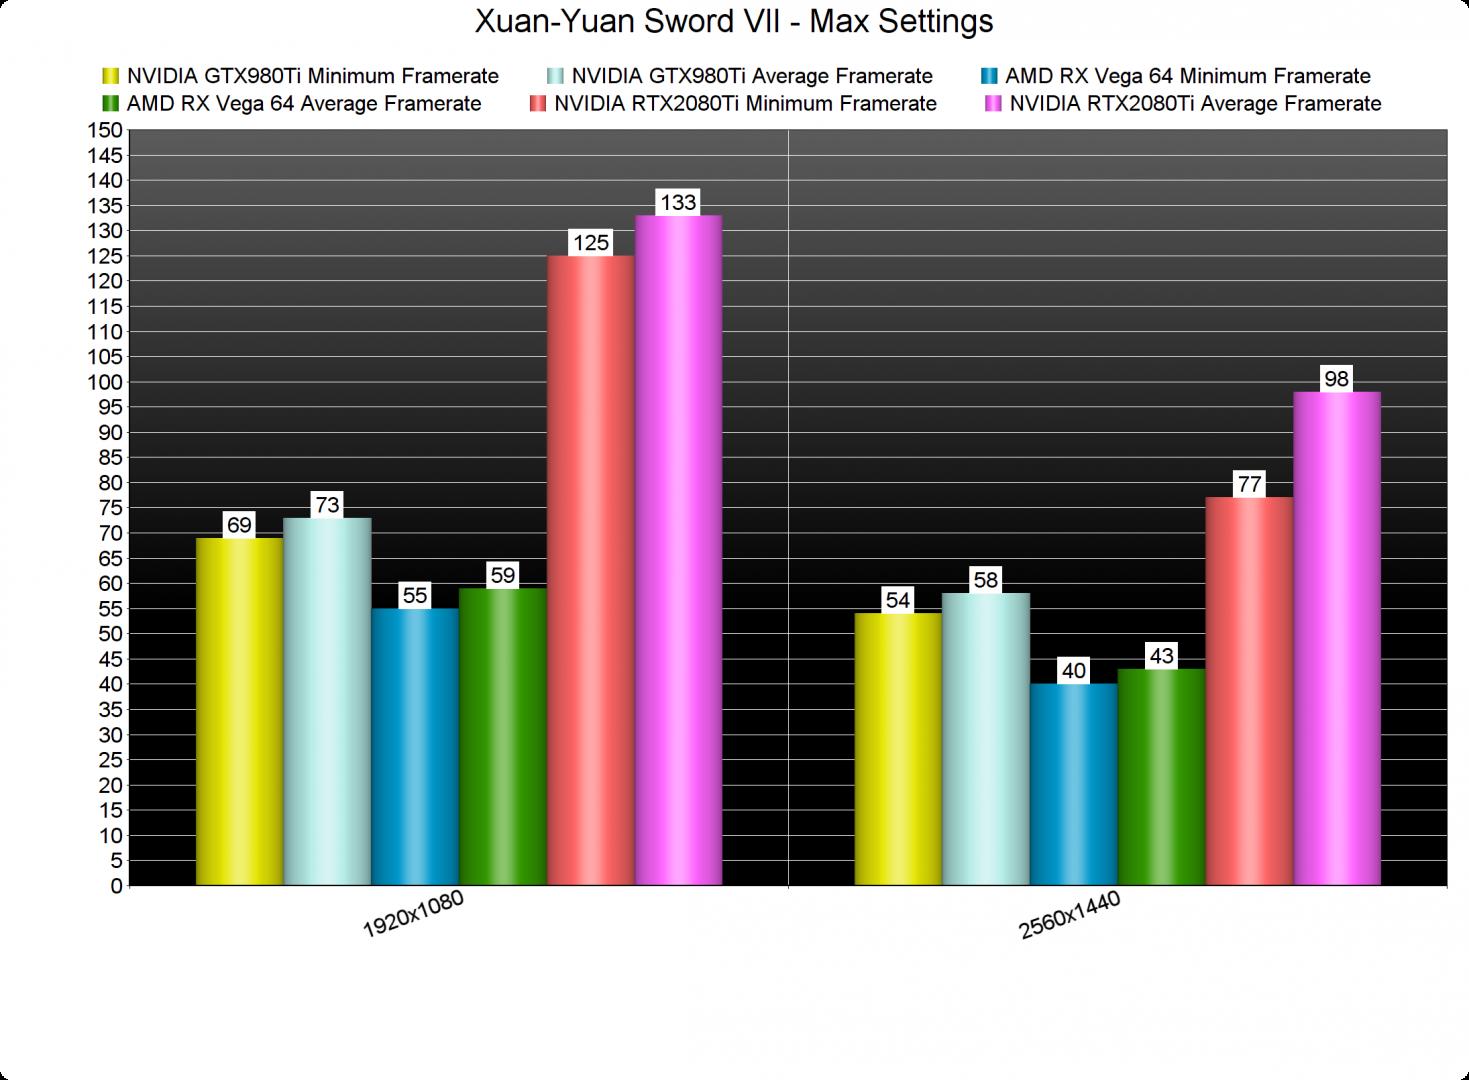 Xuan-Yuan Sword VII GPU benchmarks-2